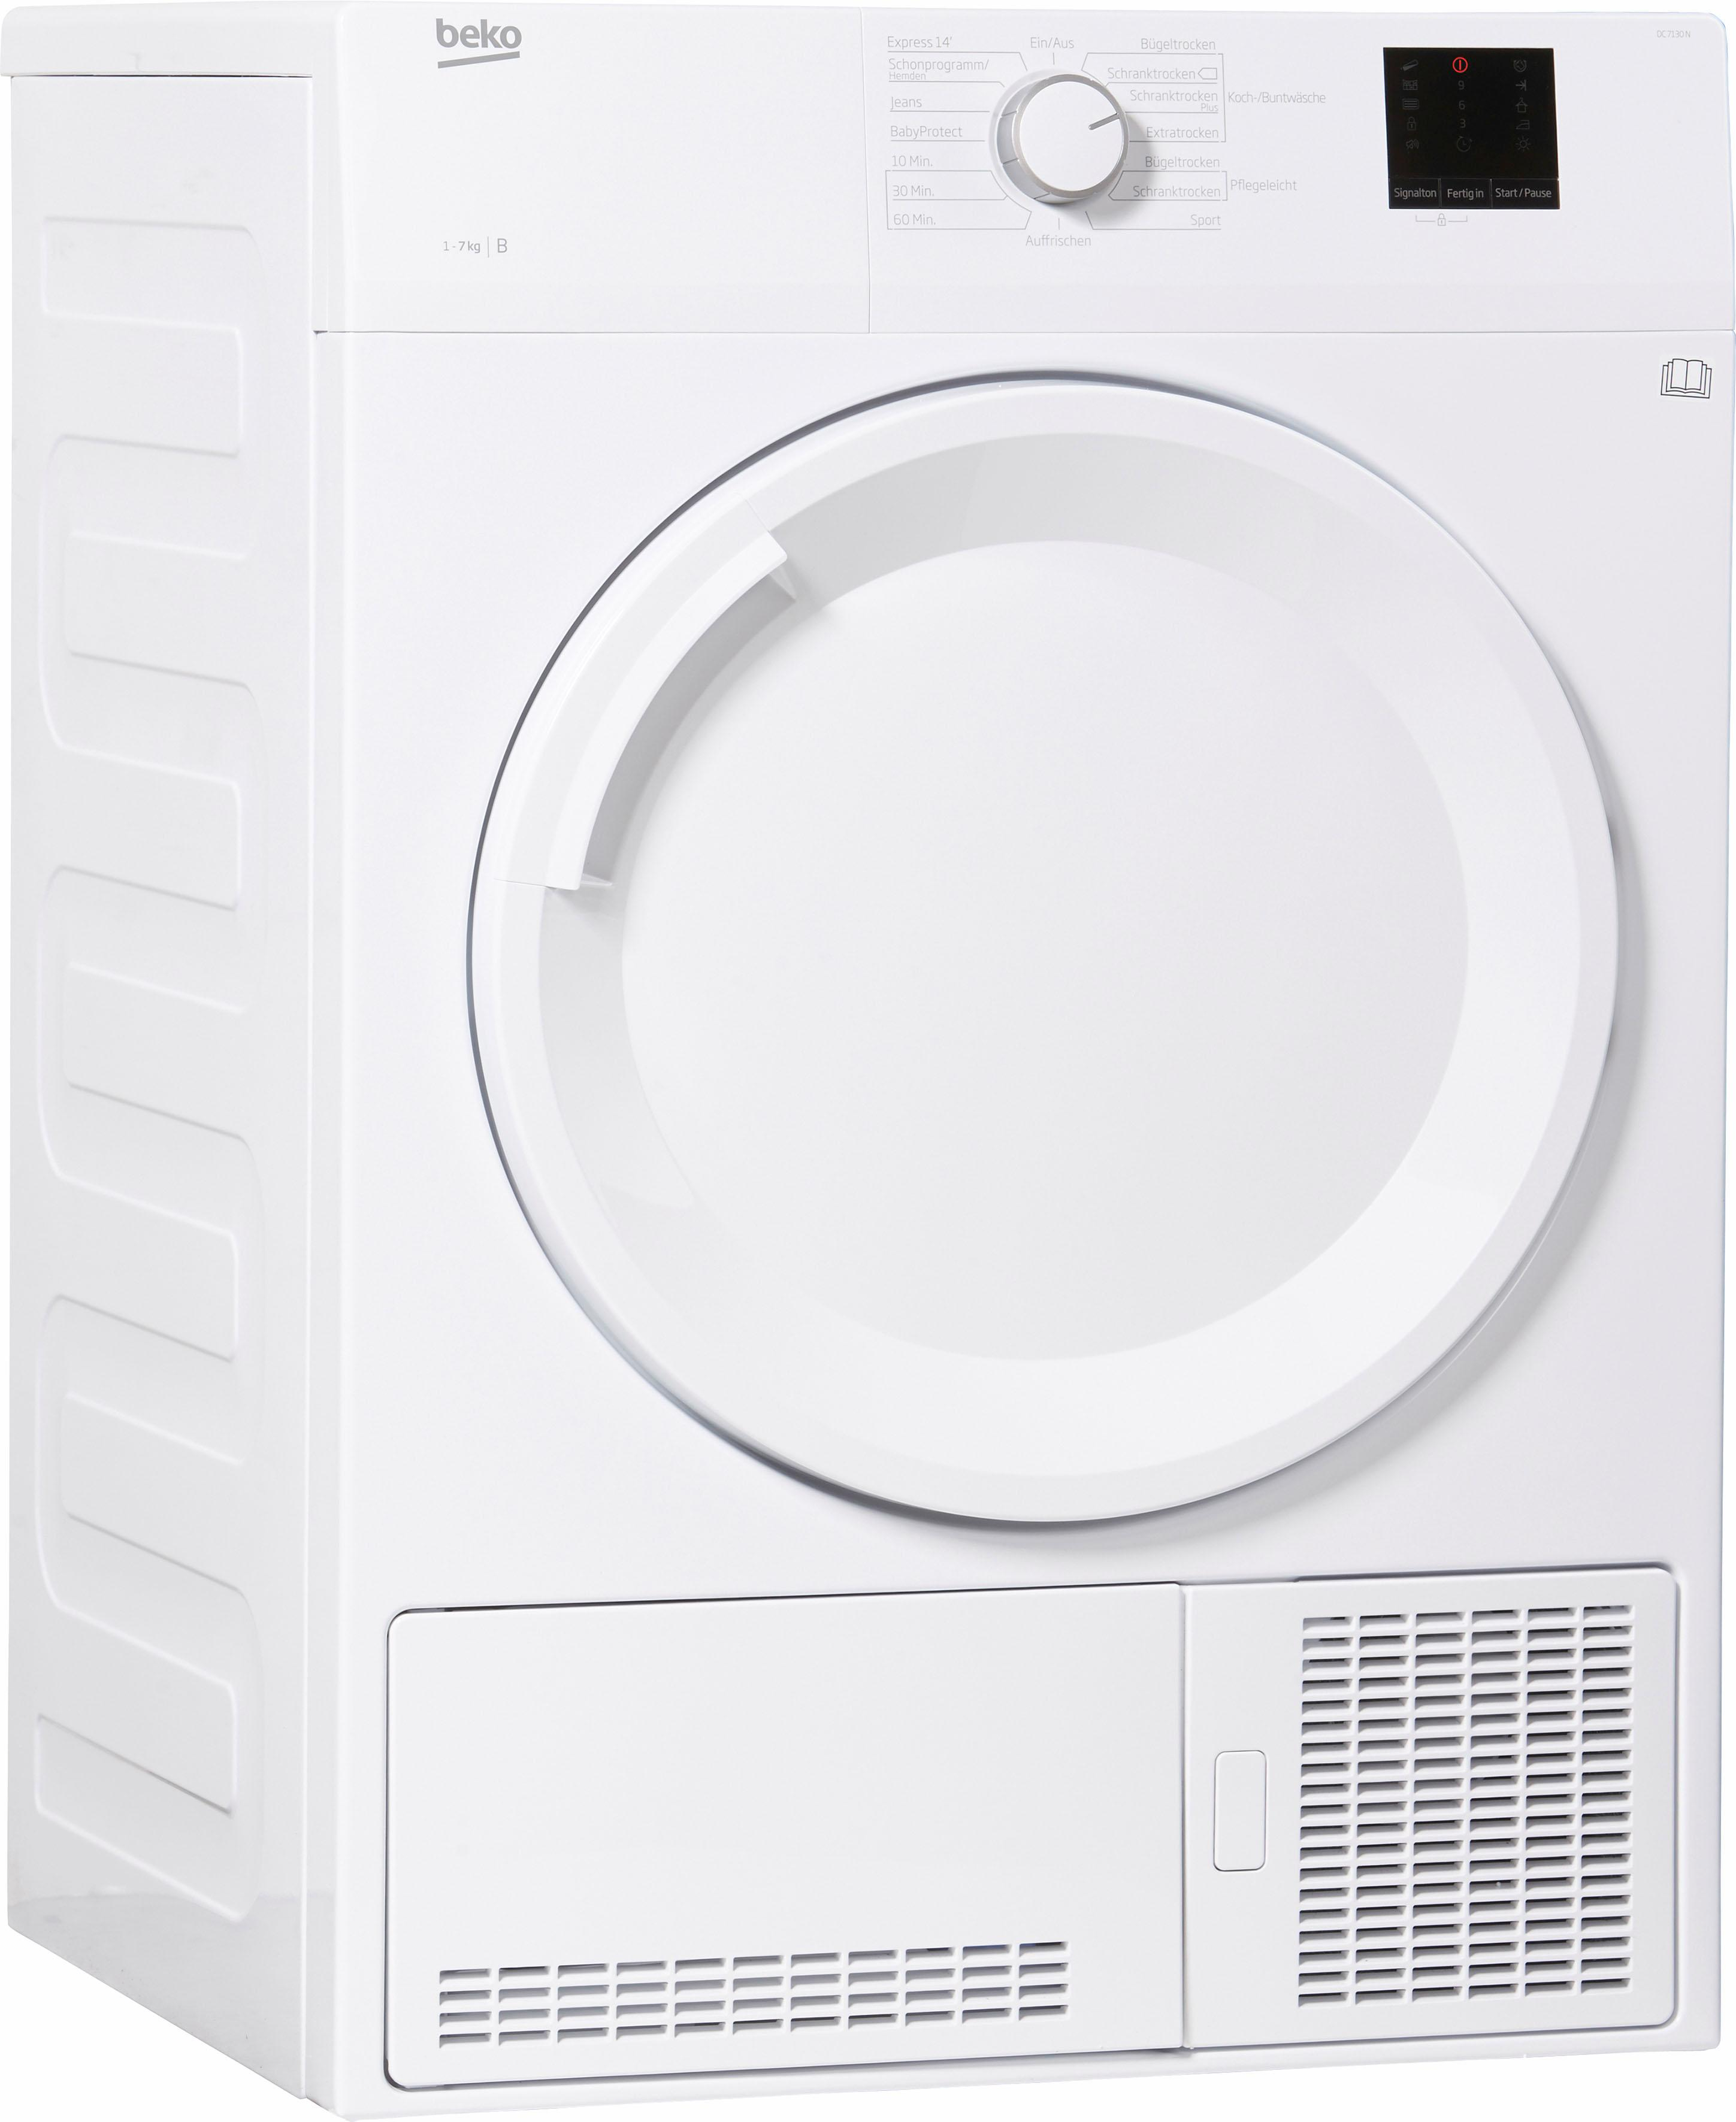 BEKO Kondenstrockner DC 7130 N, 7 kg   Bad > Waschmaschinen und Trockner > Kondenstrockner   Beko